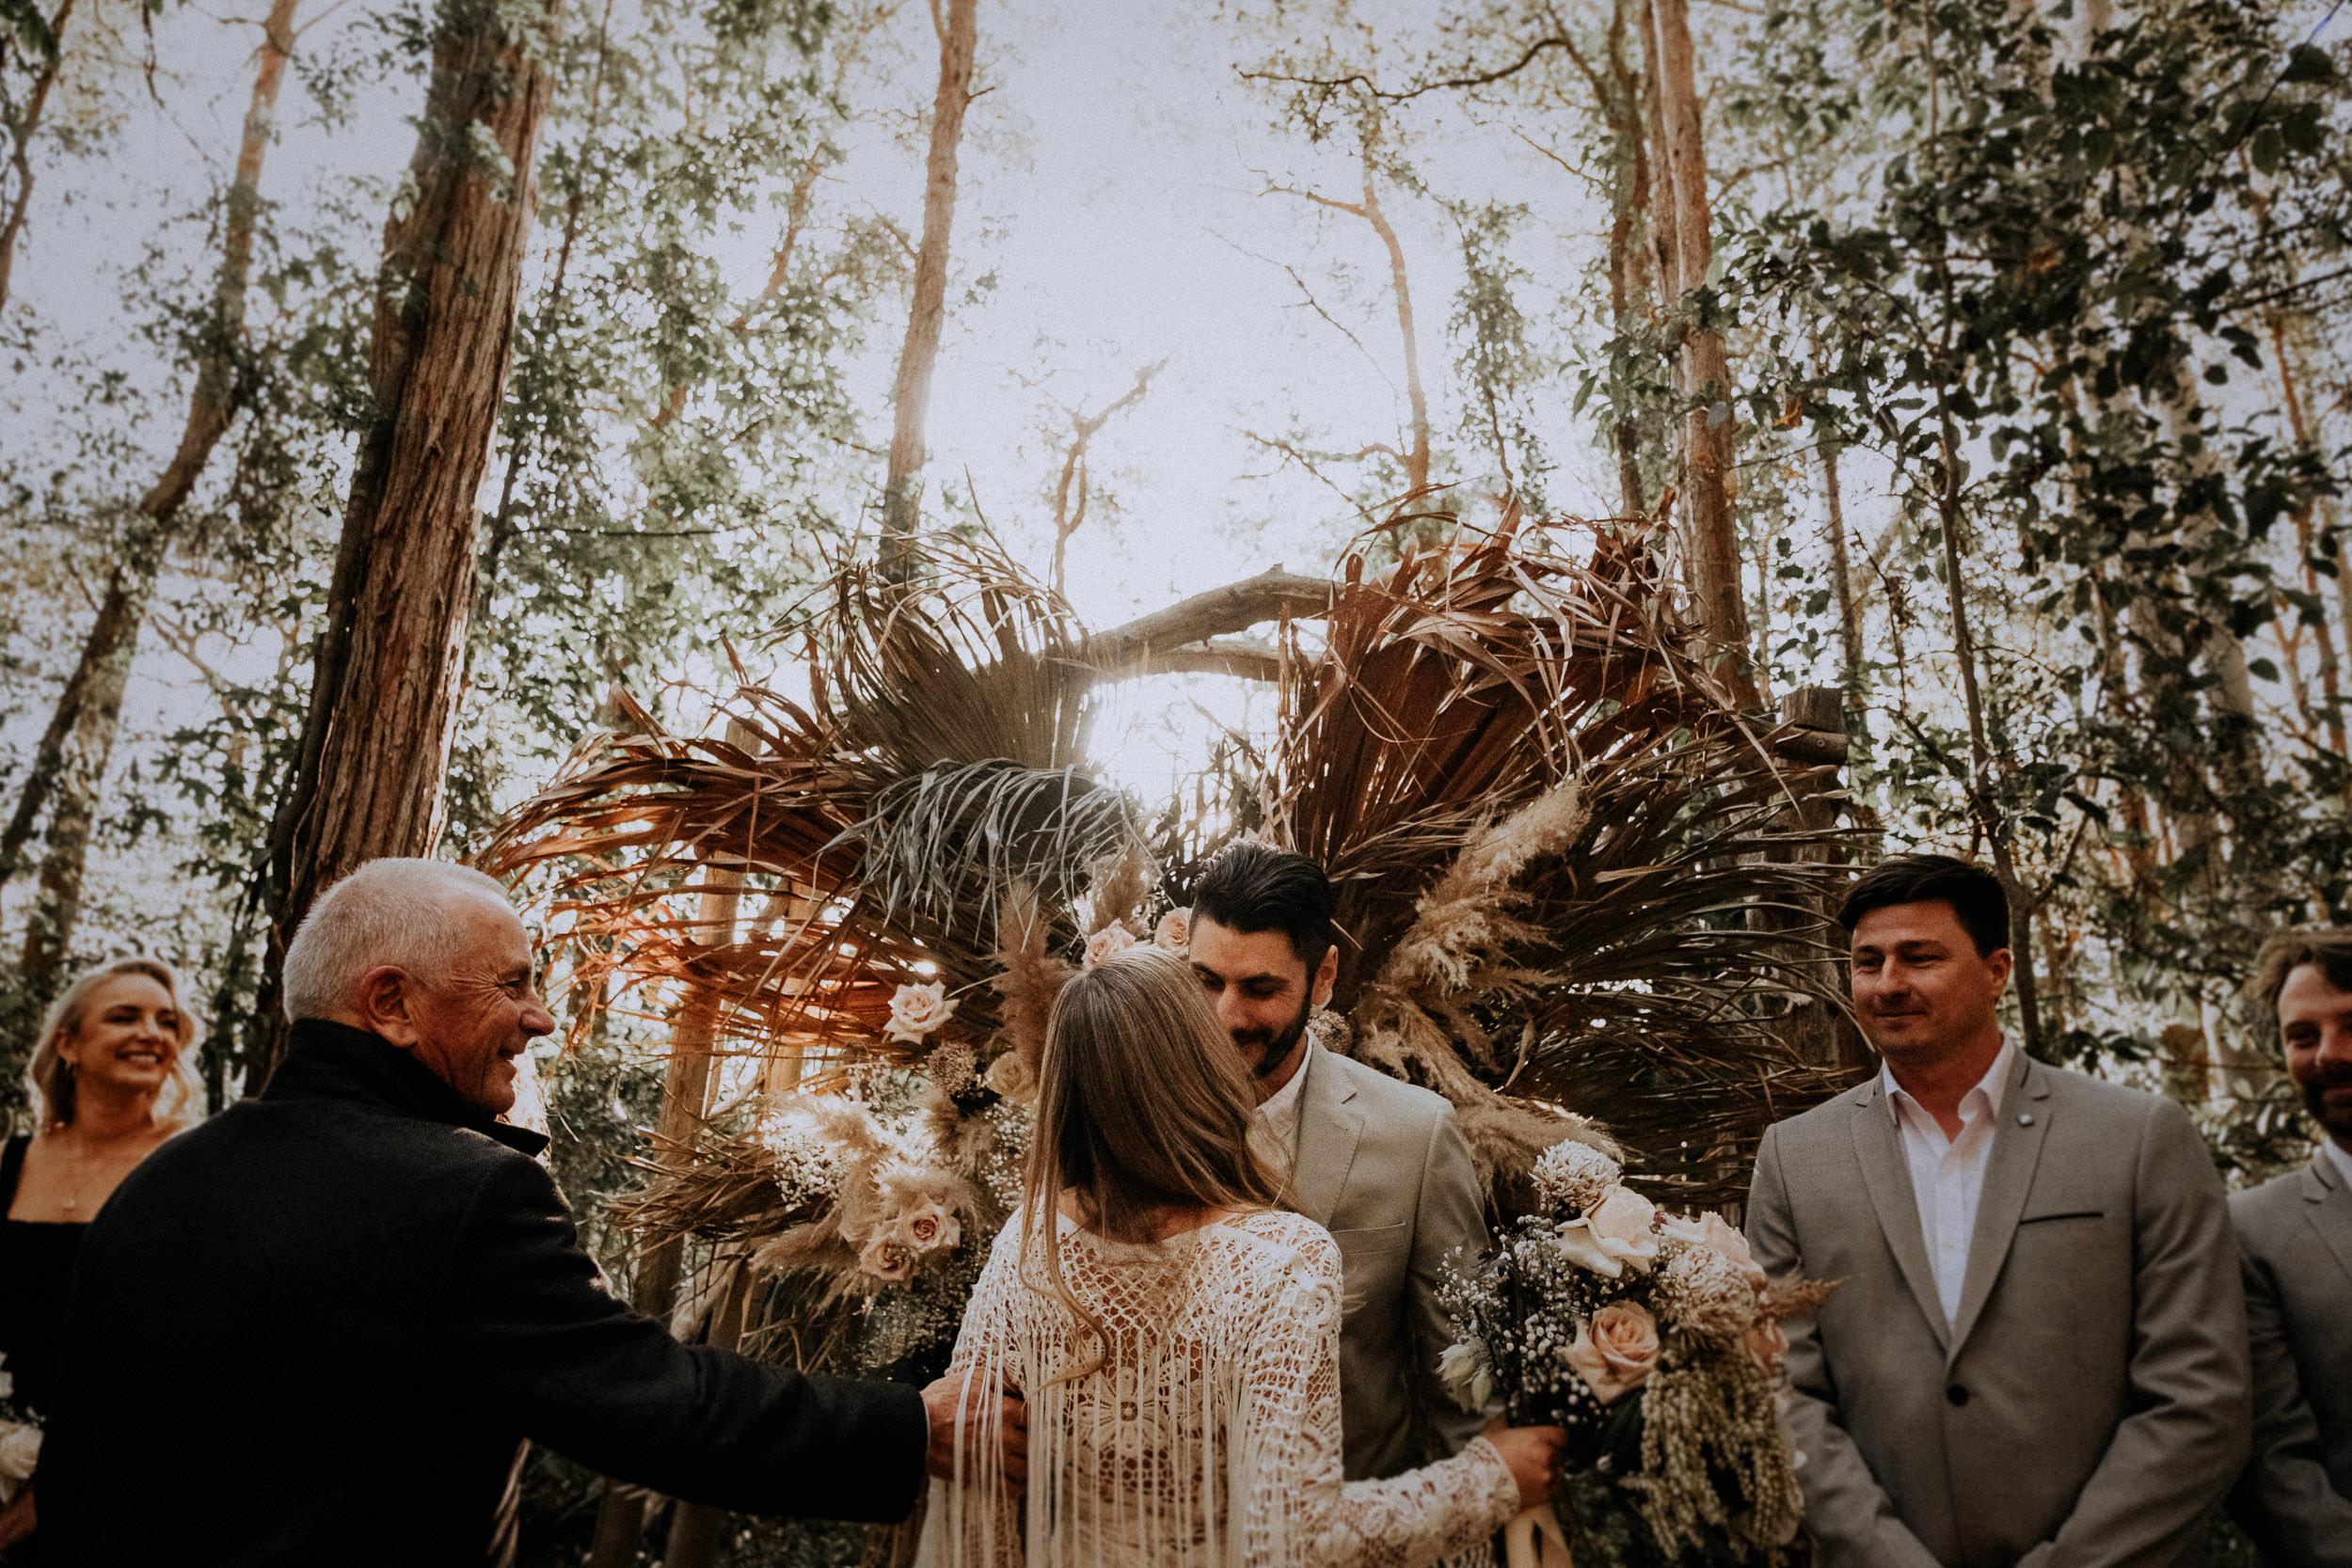 S&A Elopement - Kings & Thieves - Shred 'Til Dead - Central Coast Beach Forest Wedding - 173.jpg